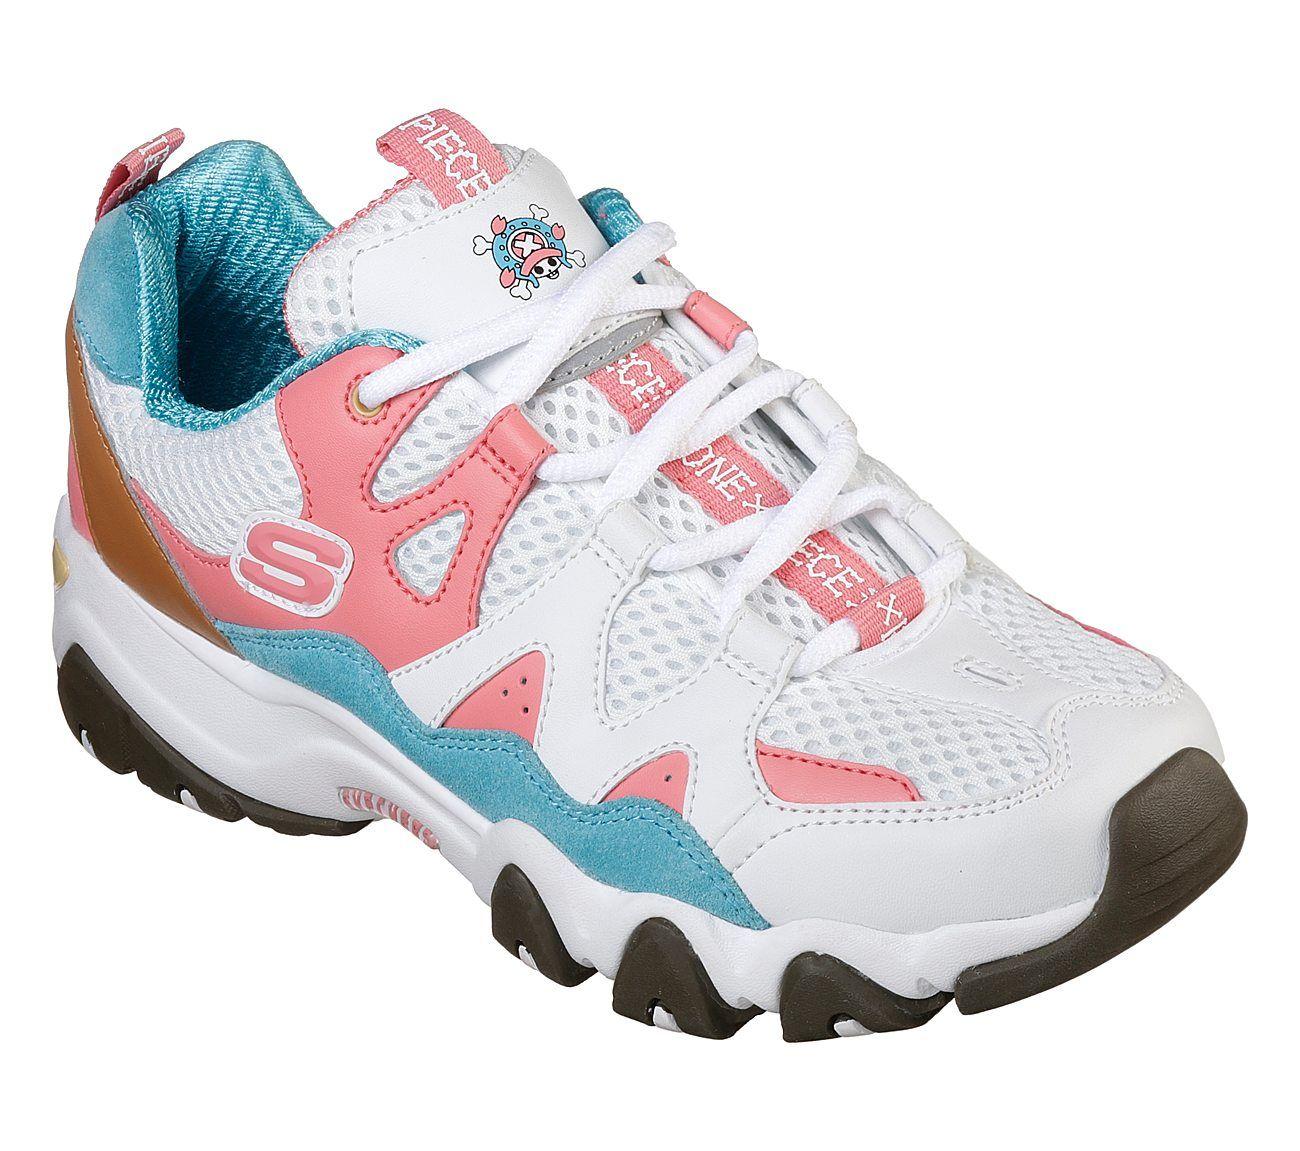 Sketchers shoes women, Skechers shoes